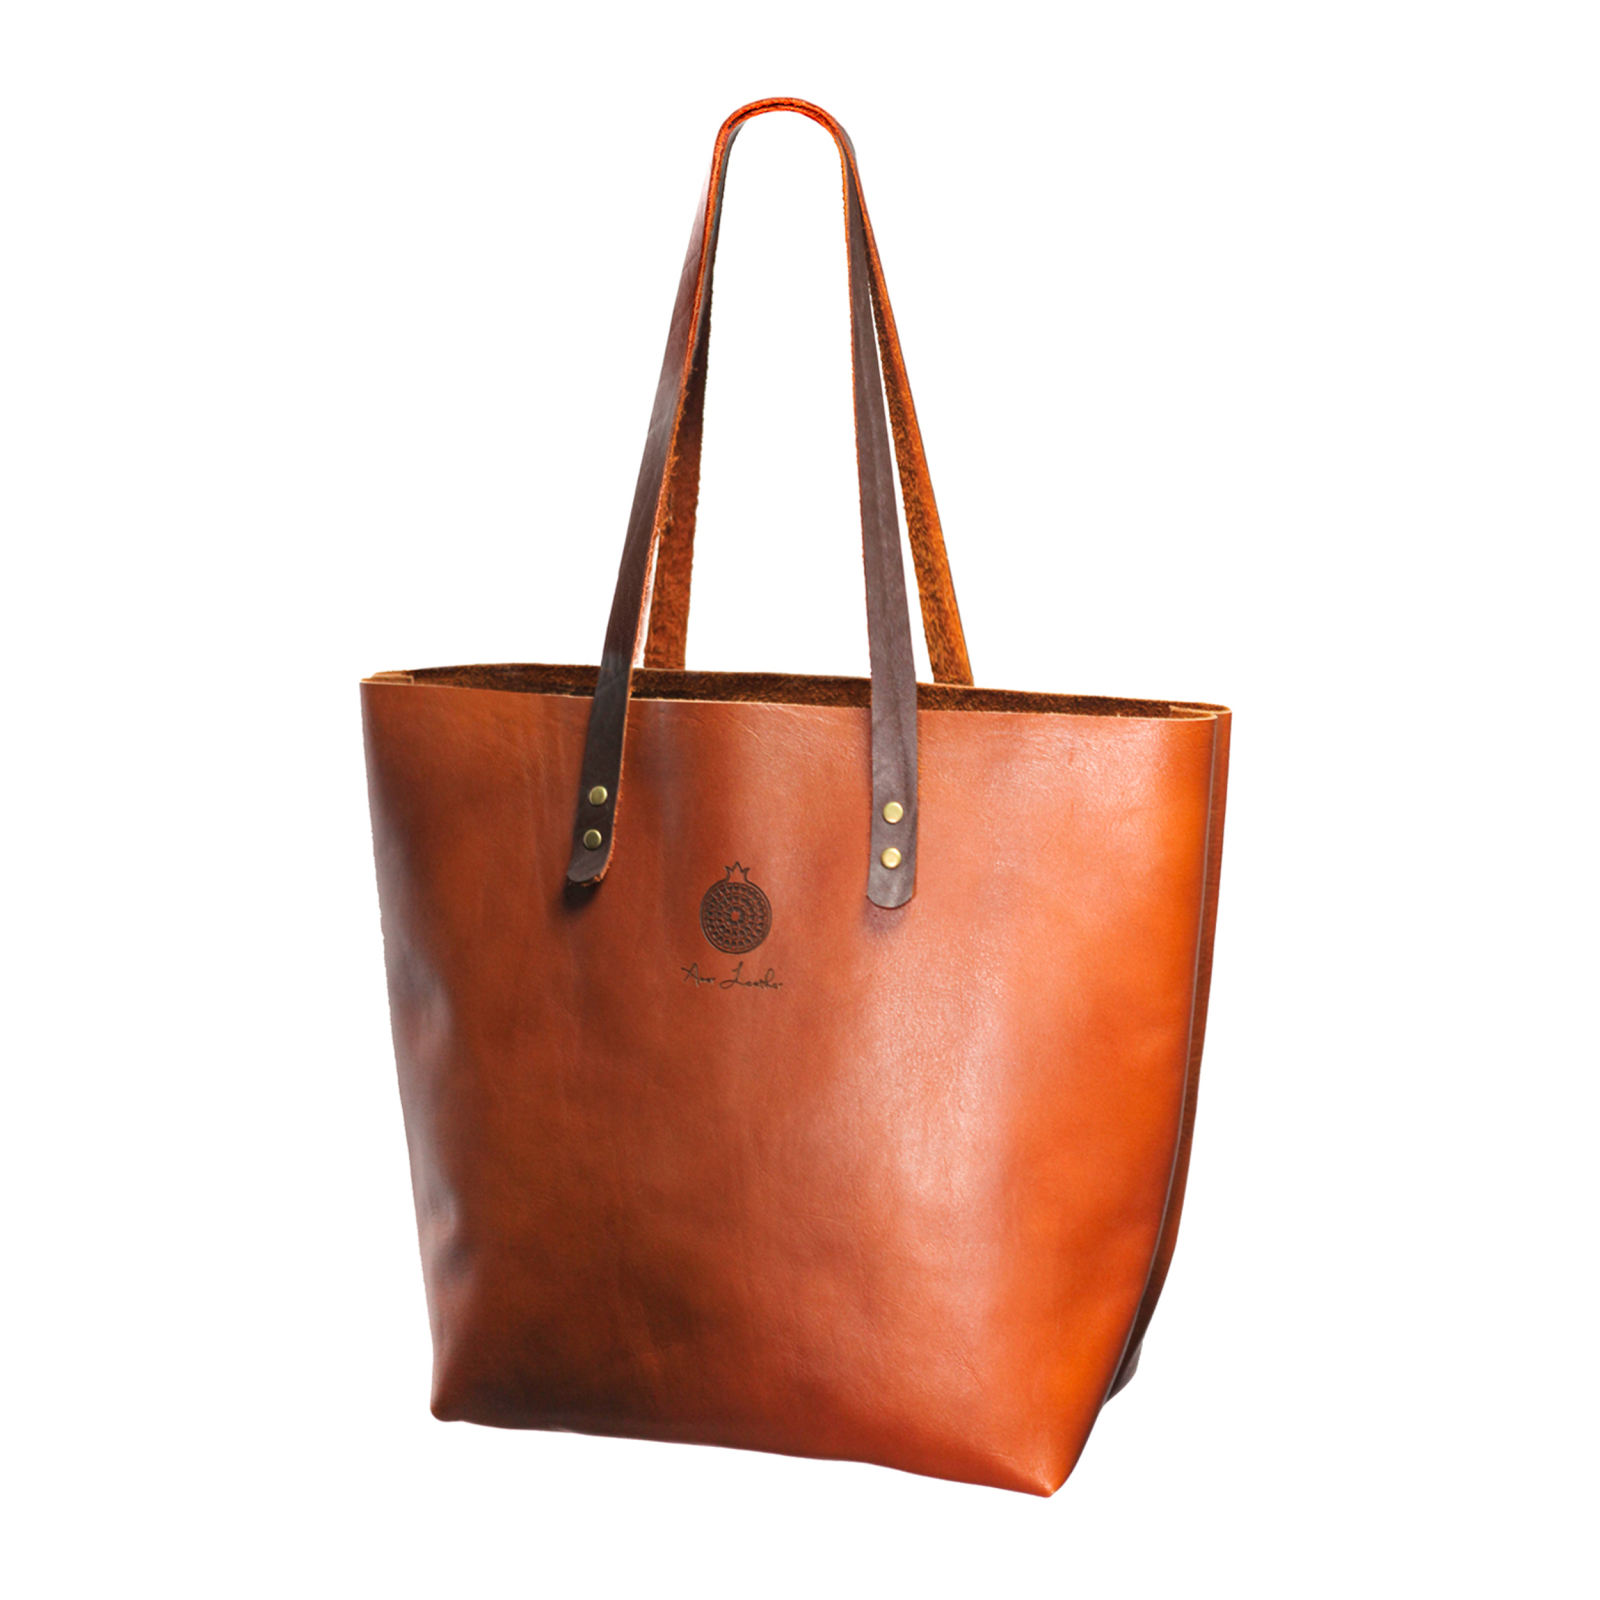 کیف دوشی زنانه انار لدر مدل کارینا -  - 11